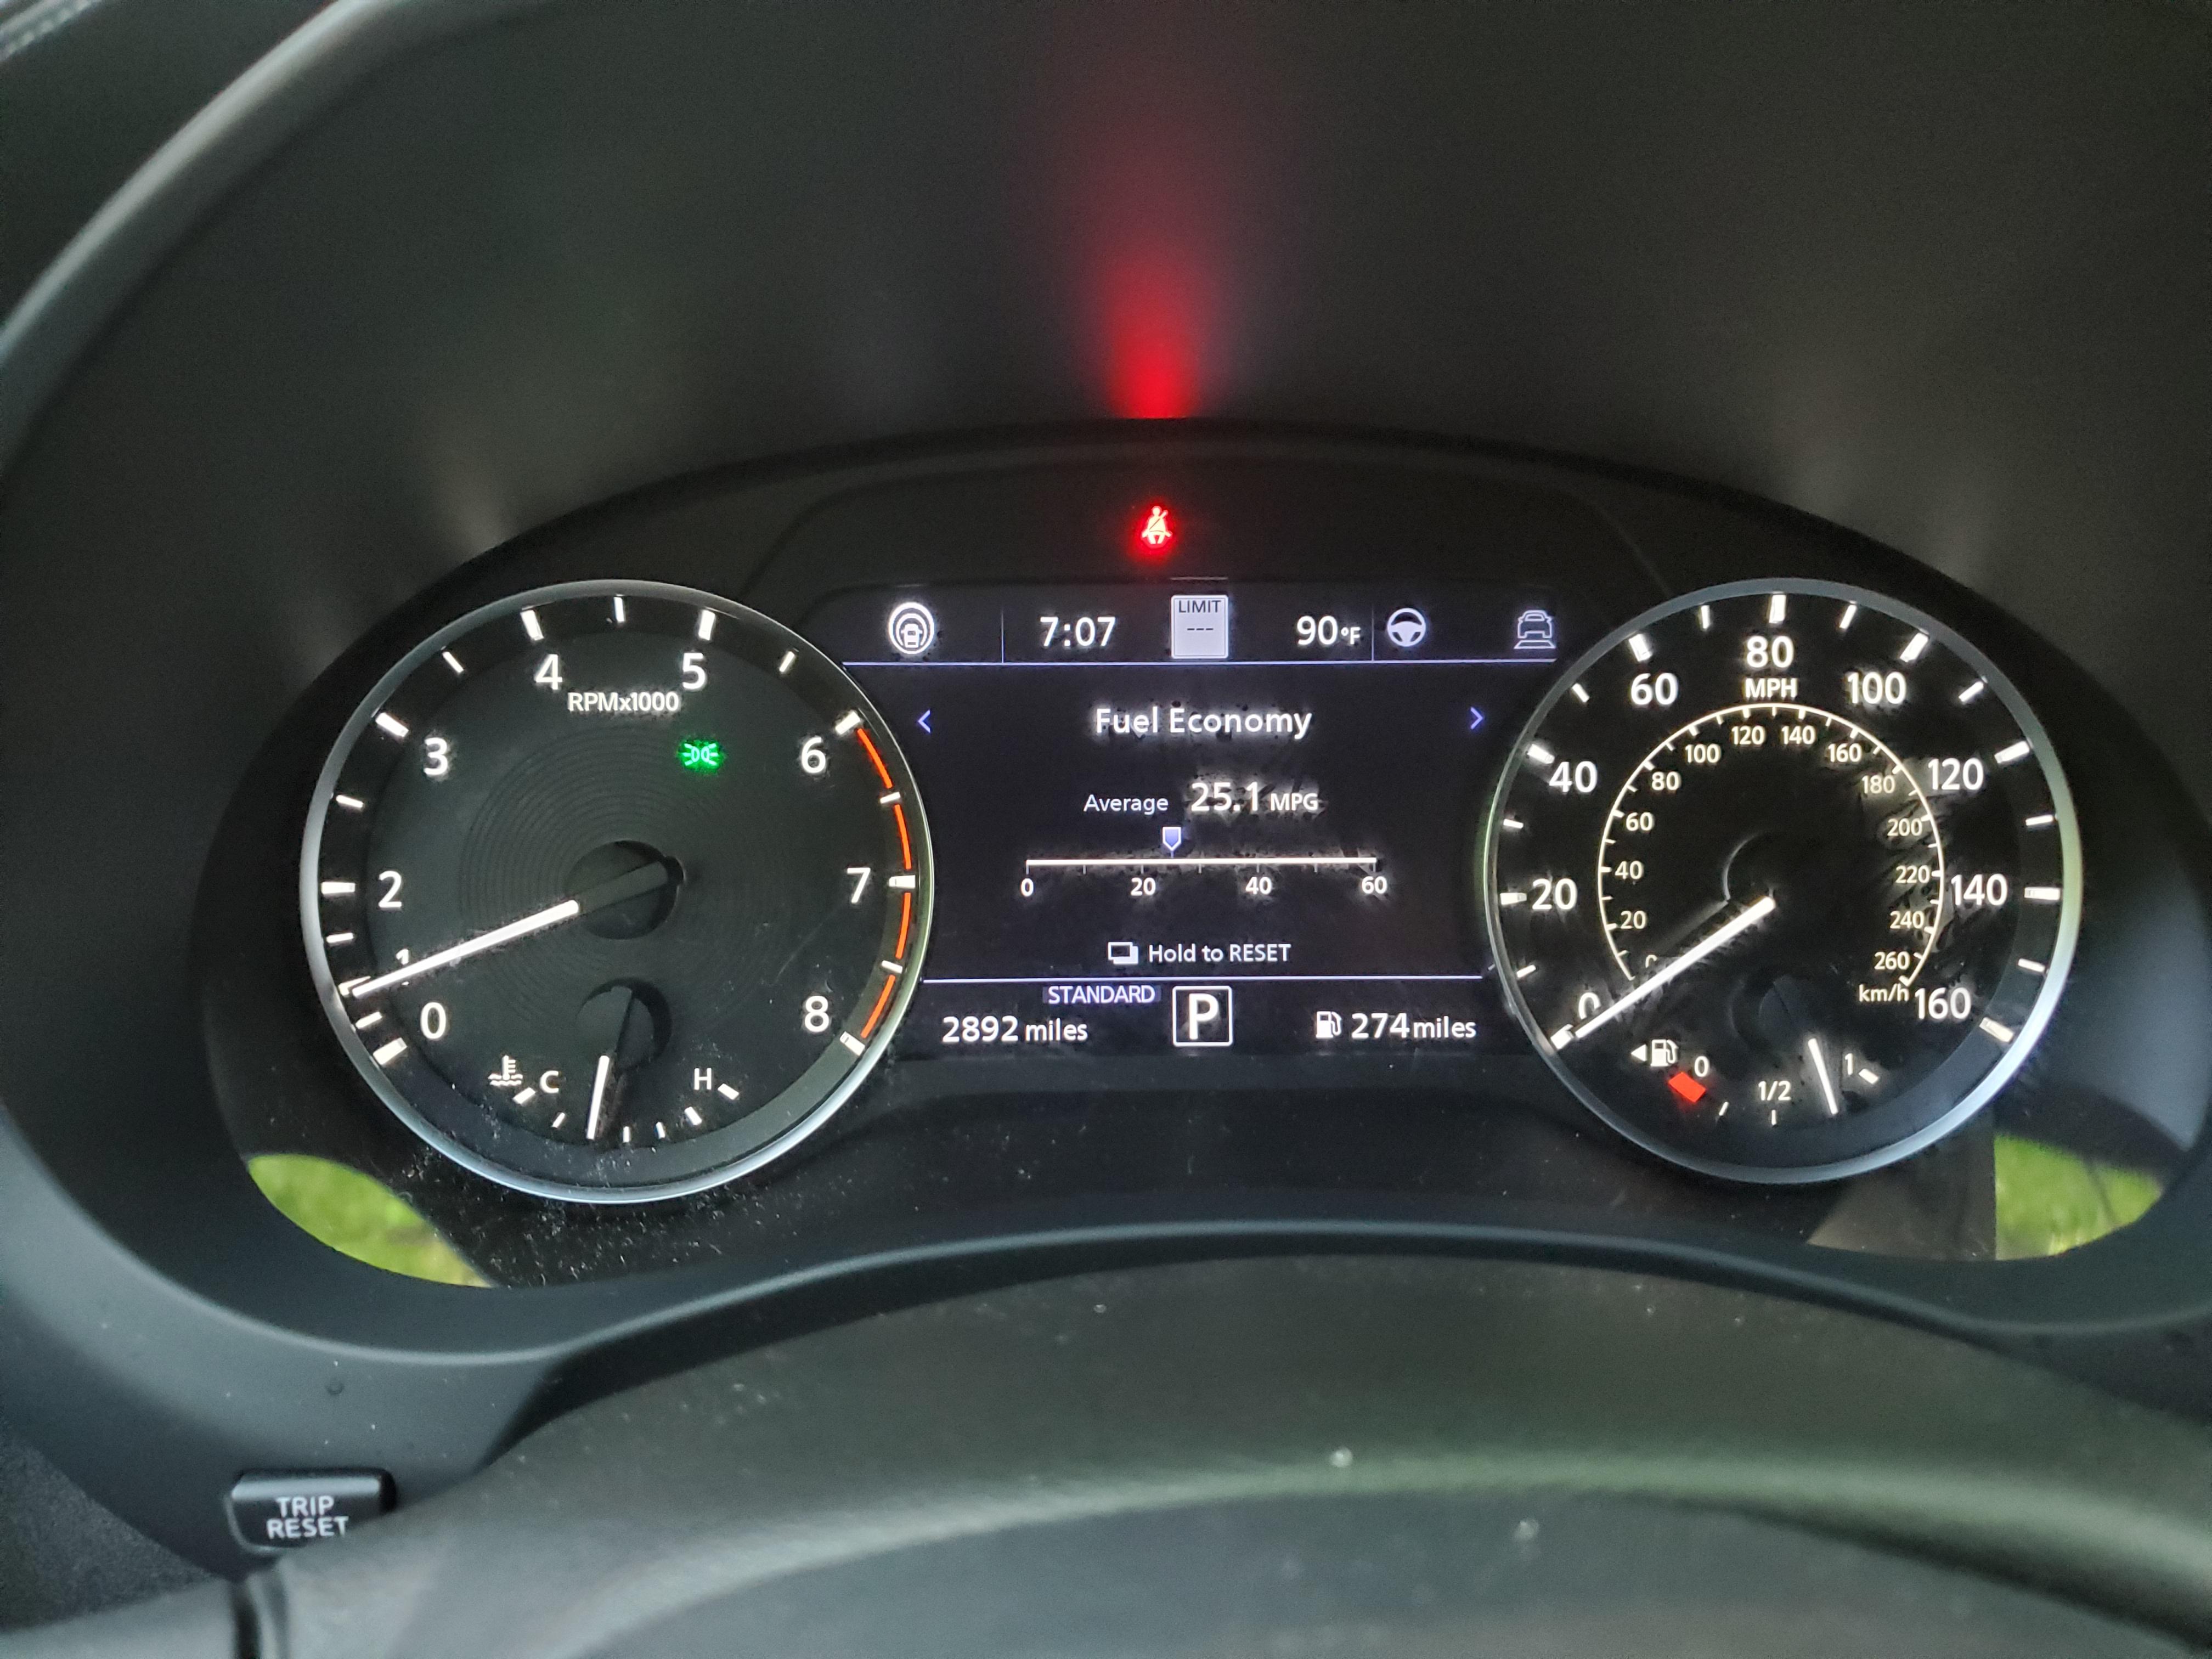 Infiniti QX55 Fuel Economy gauge